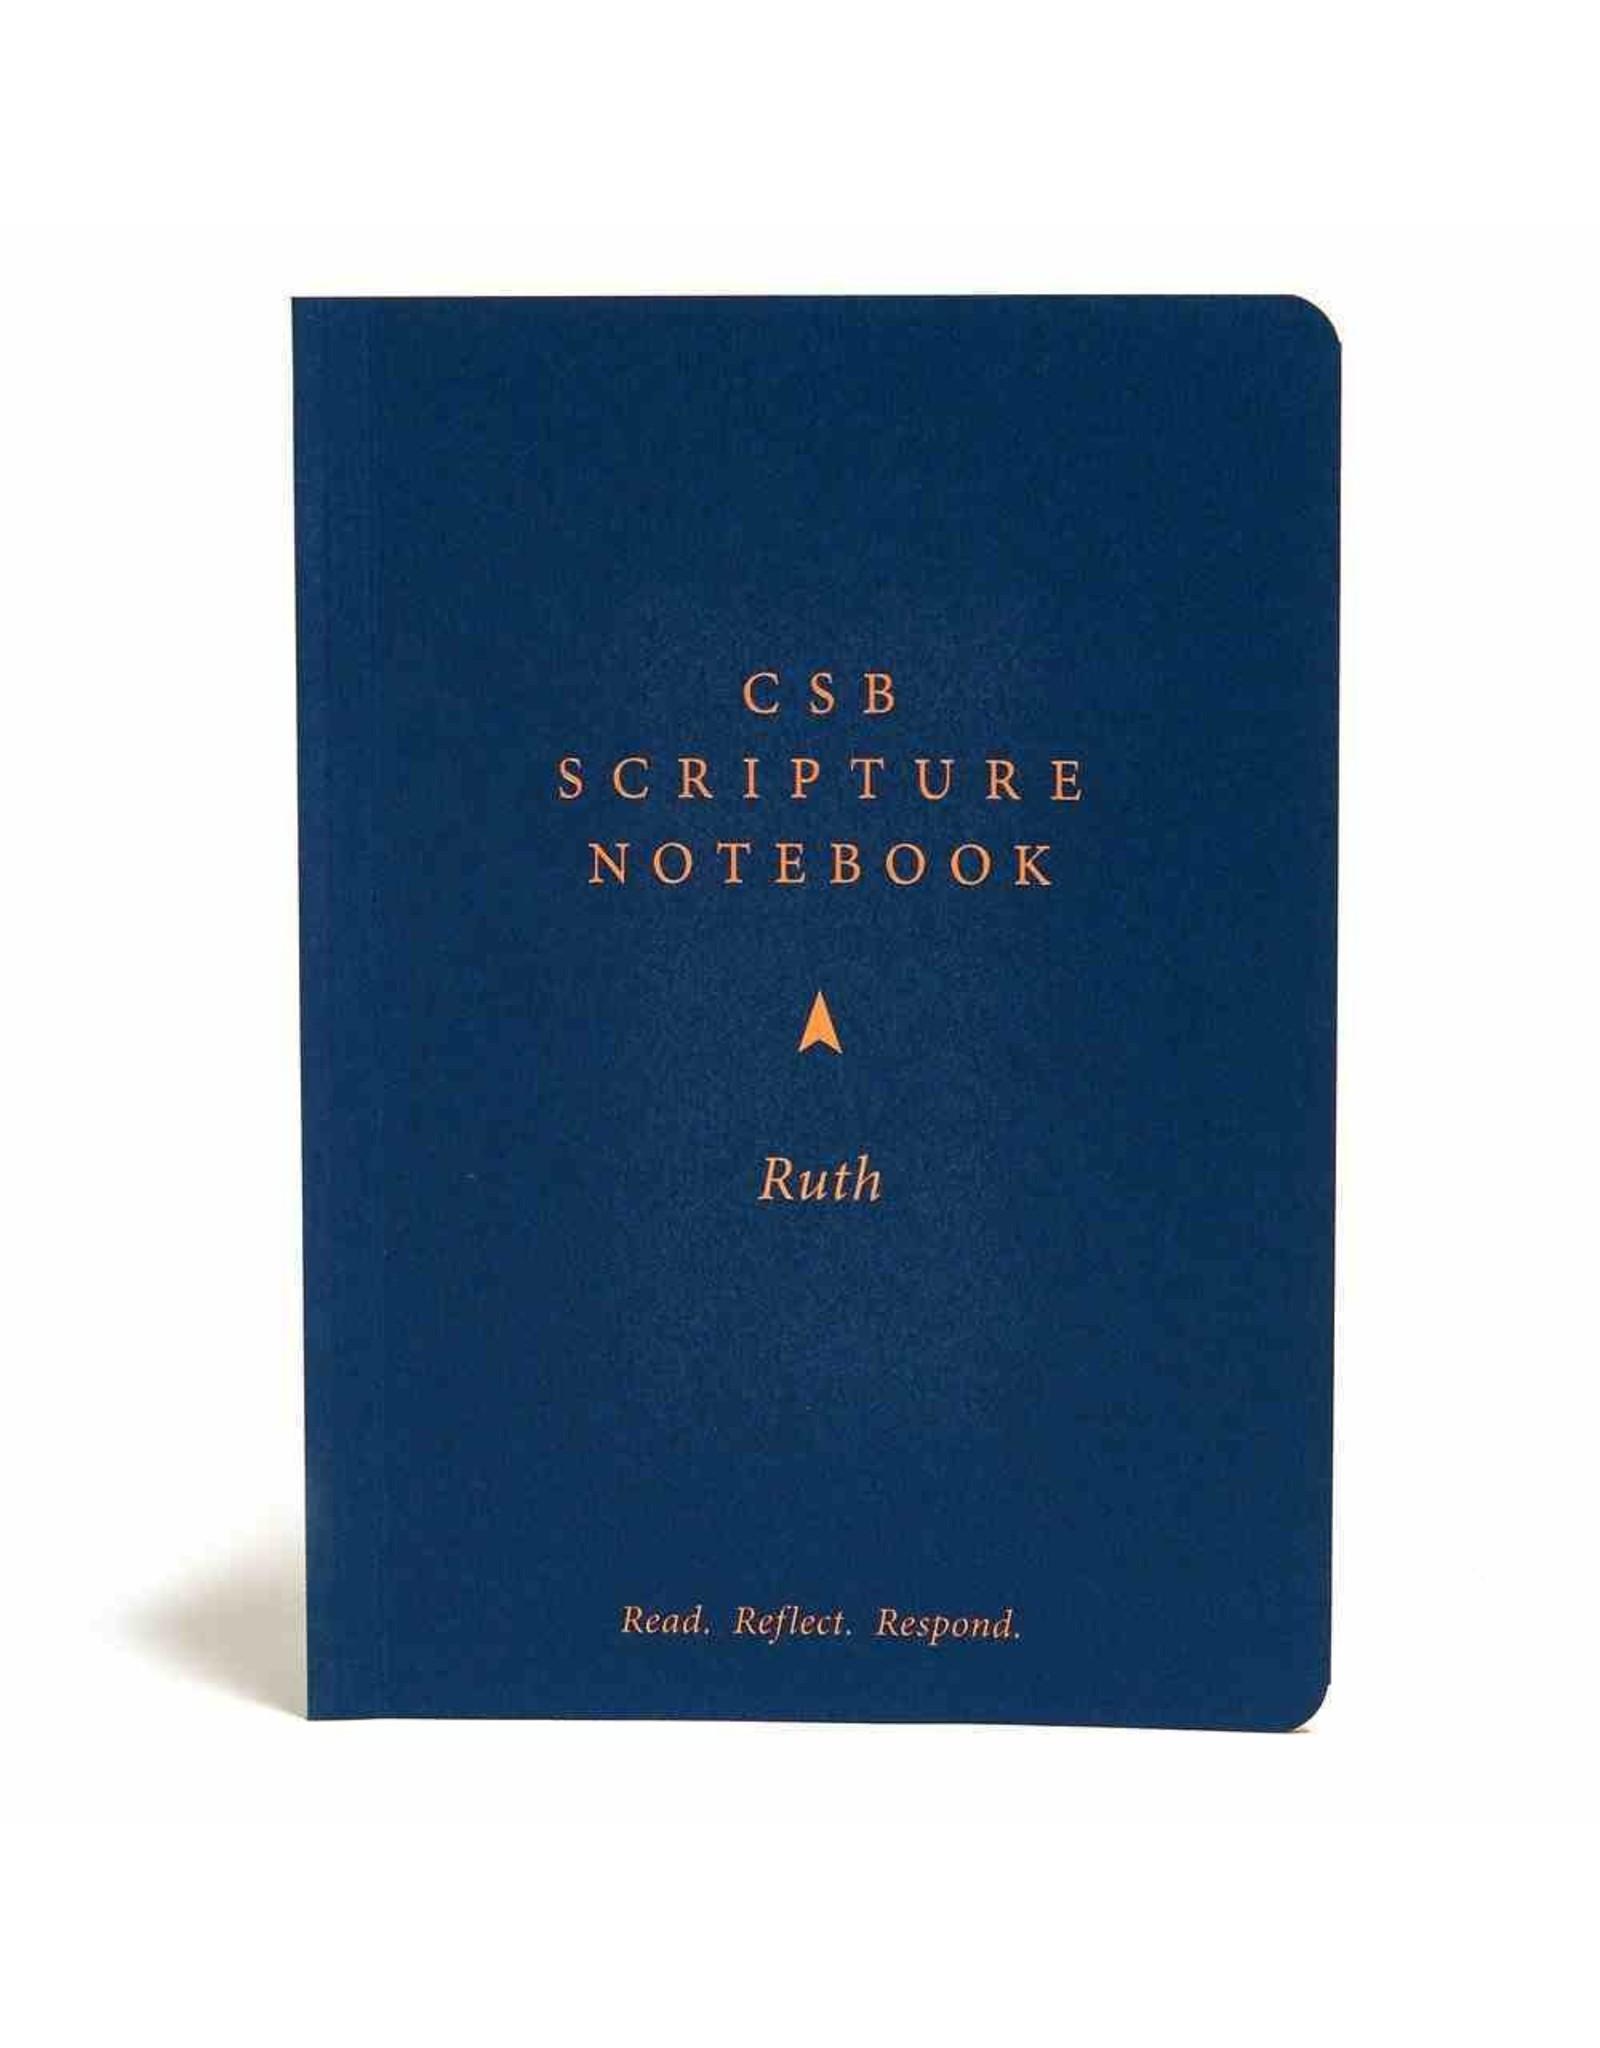 Holman CSB Scripture Notebook - Ruth